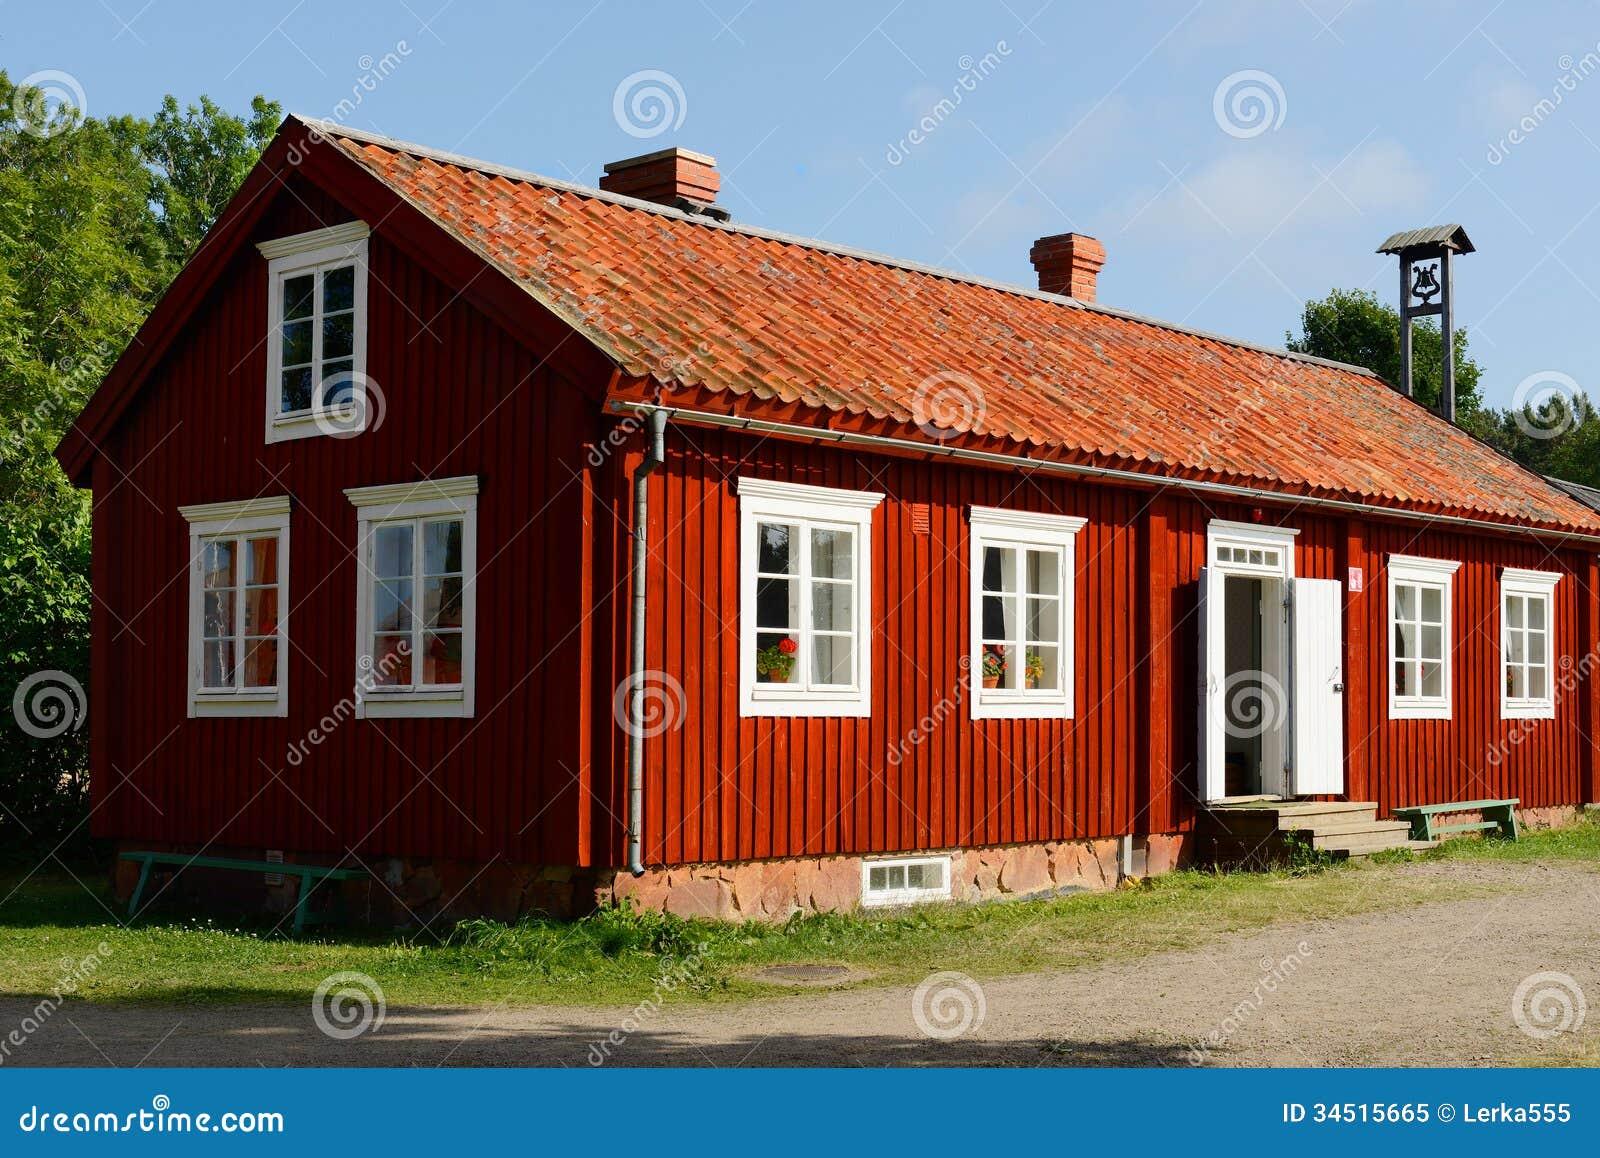 falu rödfärg